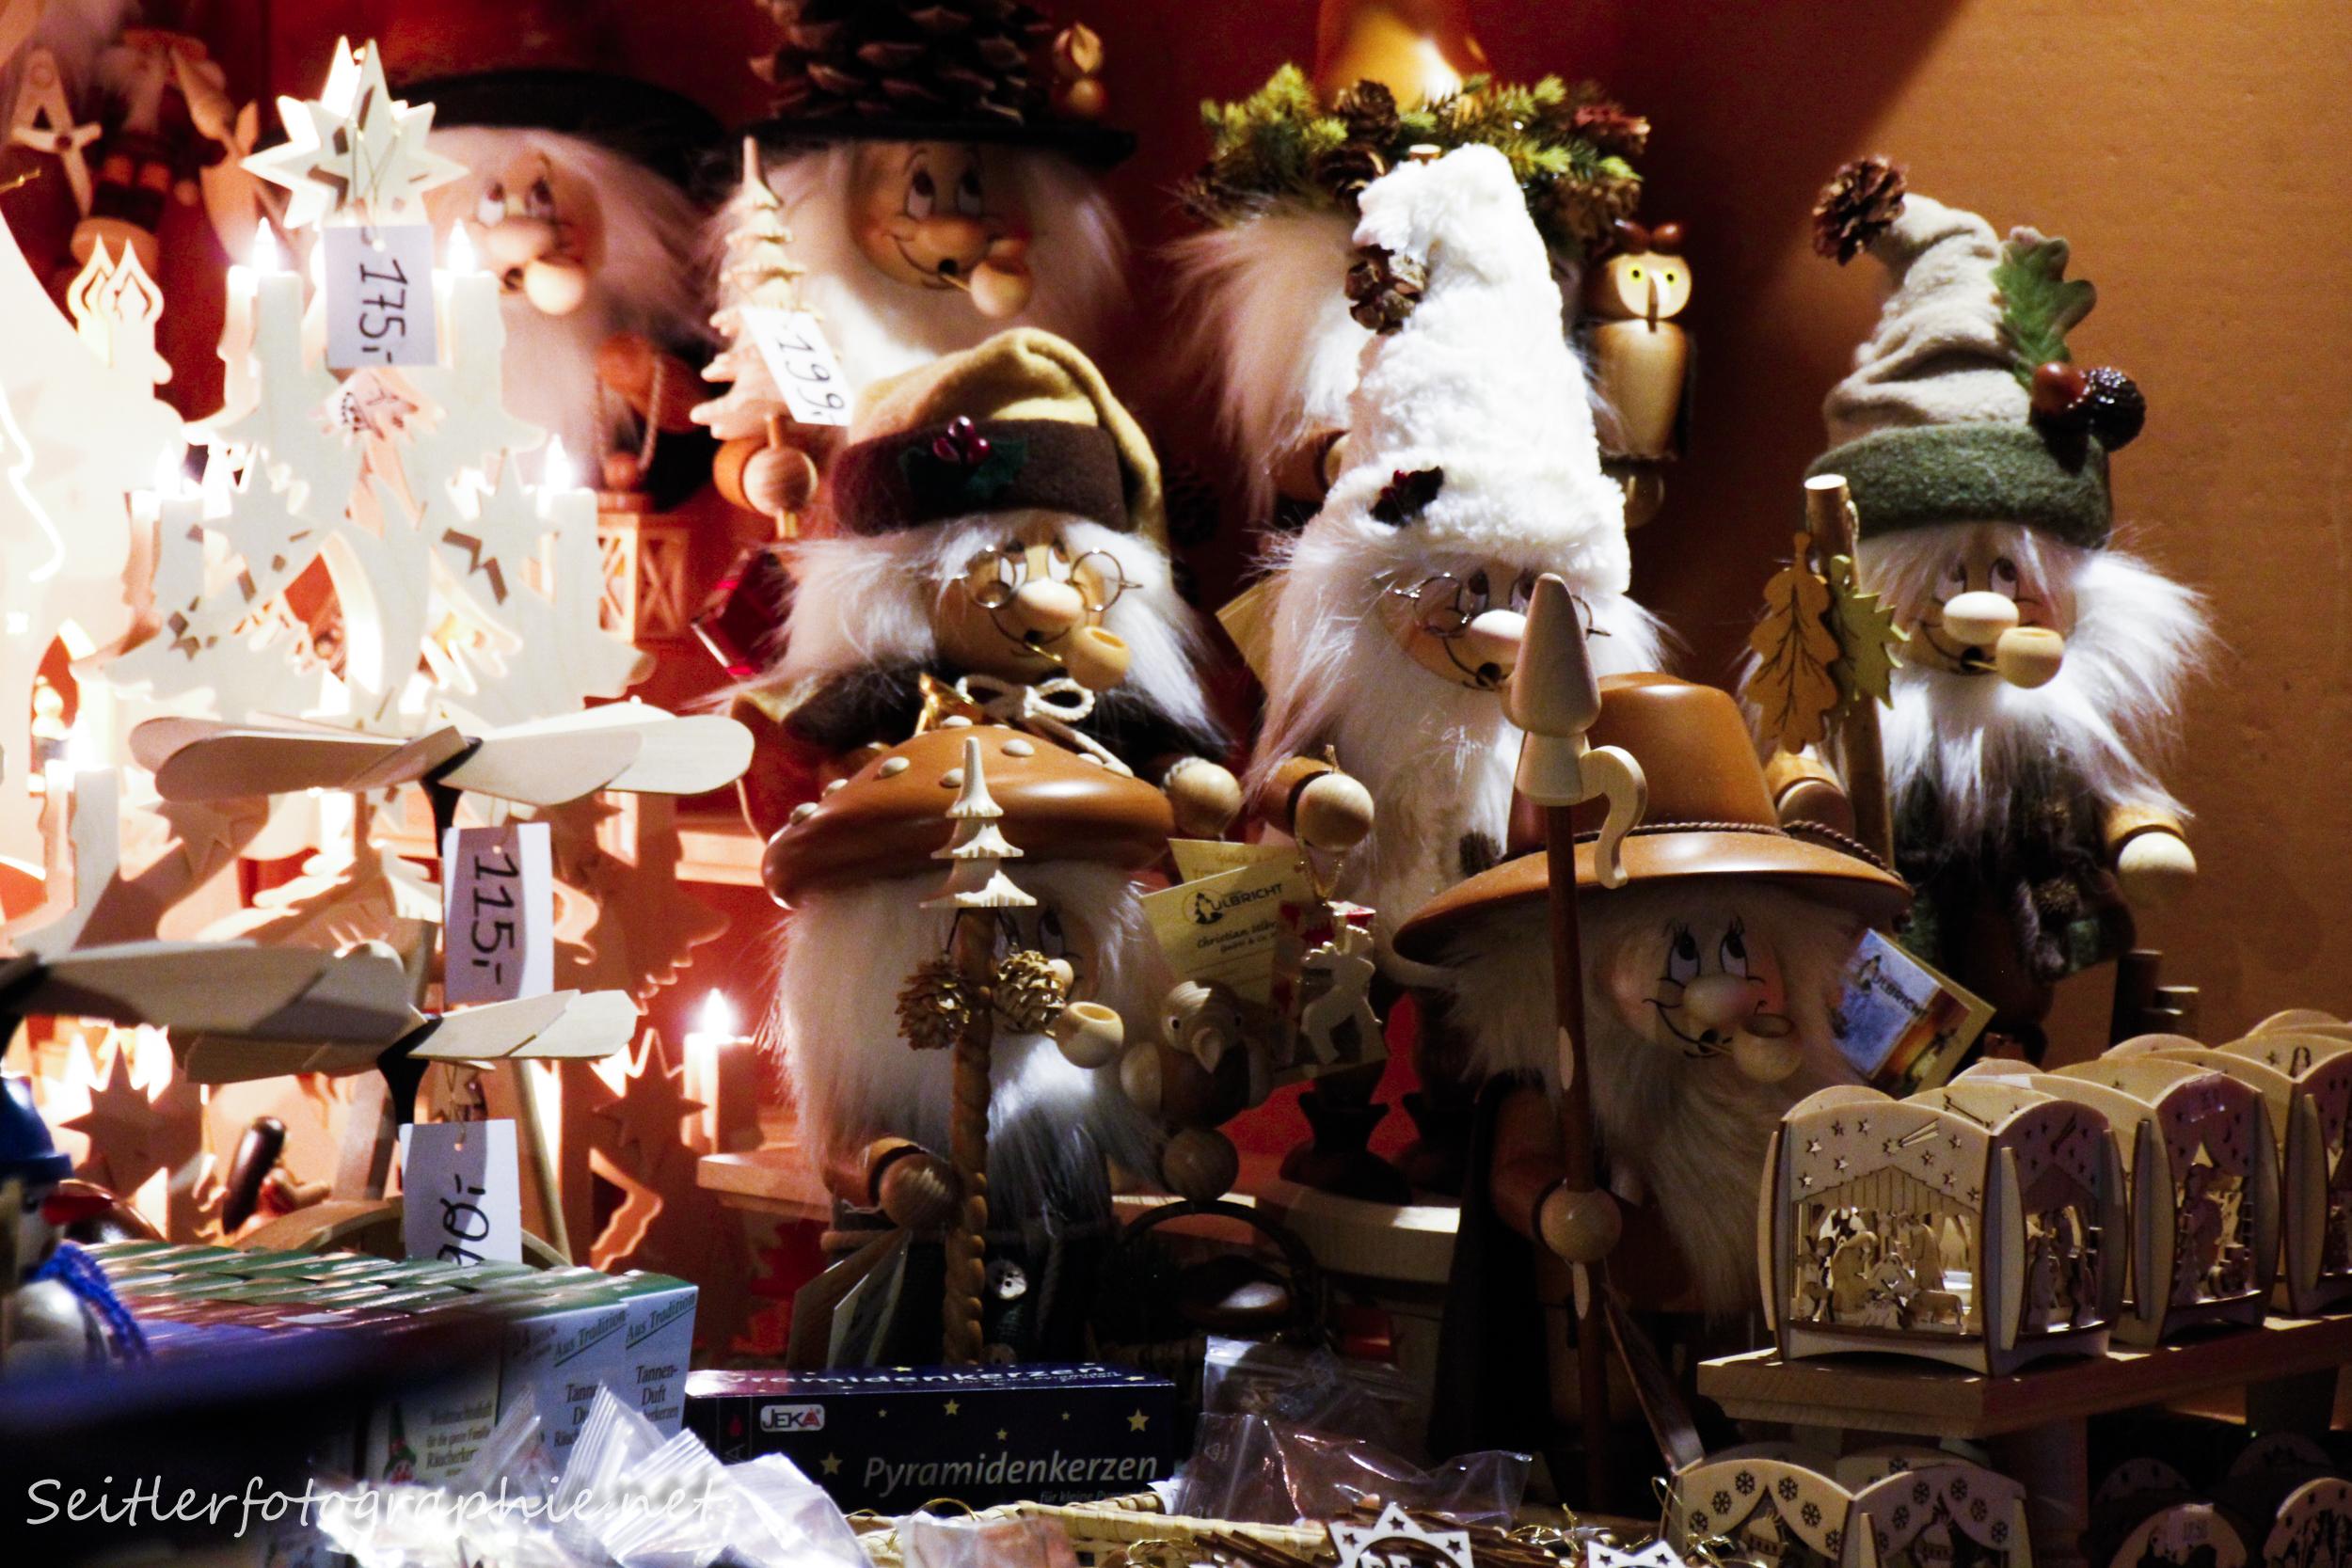 20161127_weihnachtsmarkt_joannarutkoseitler_37